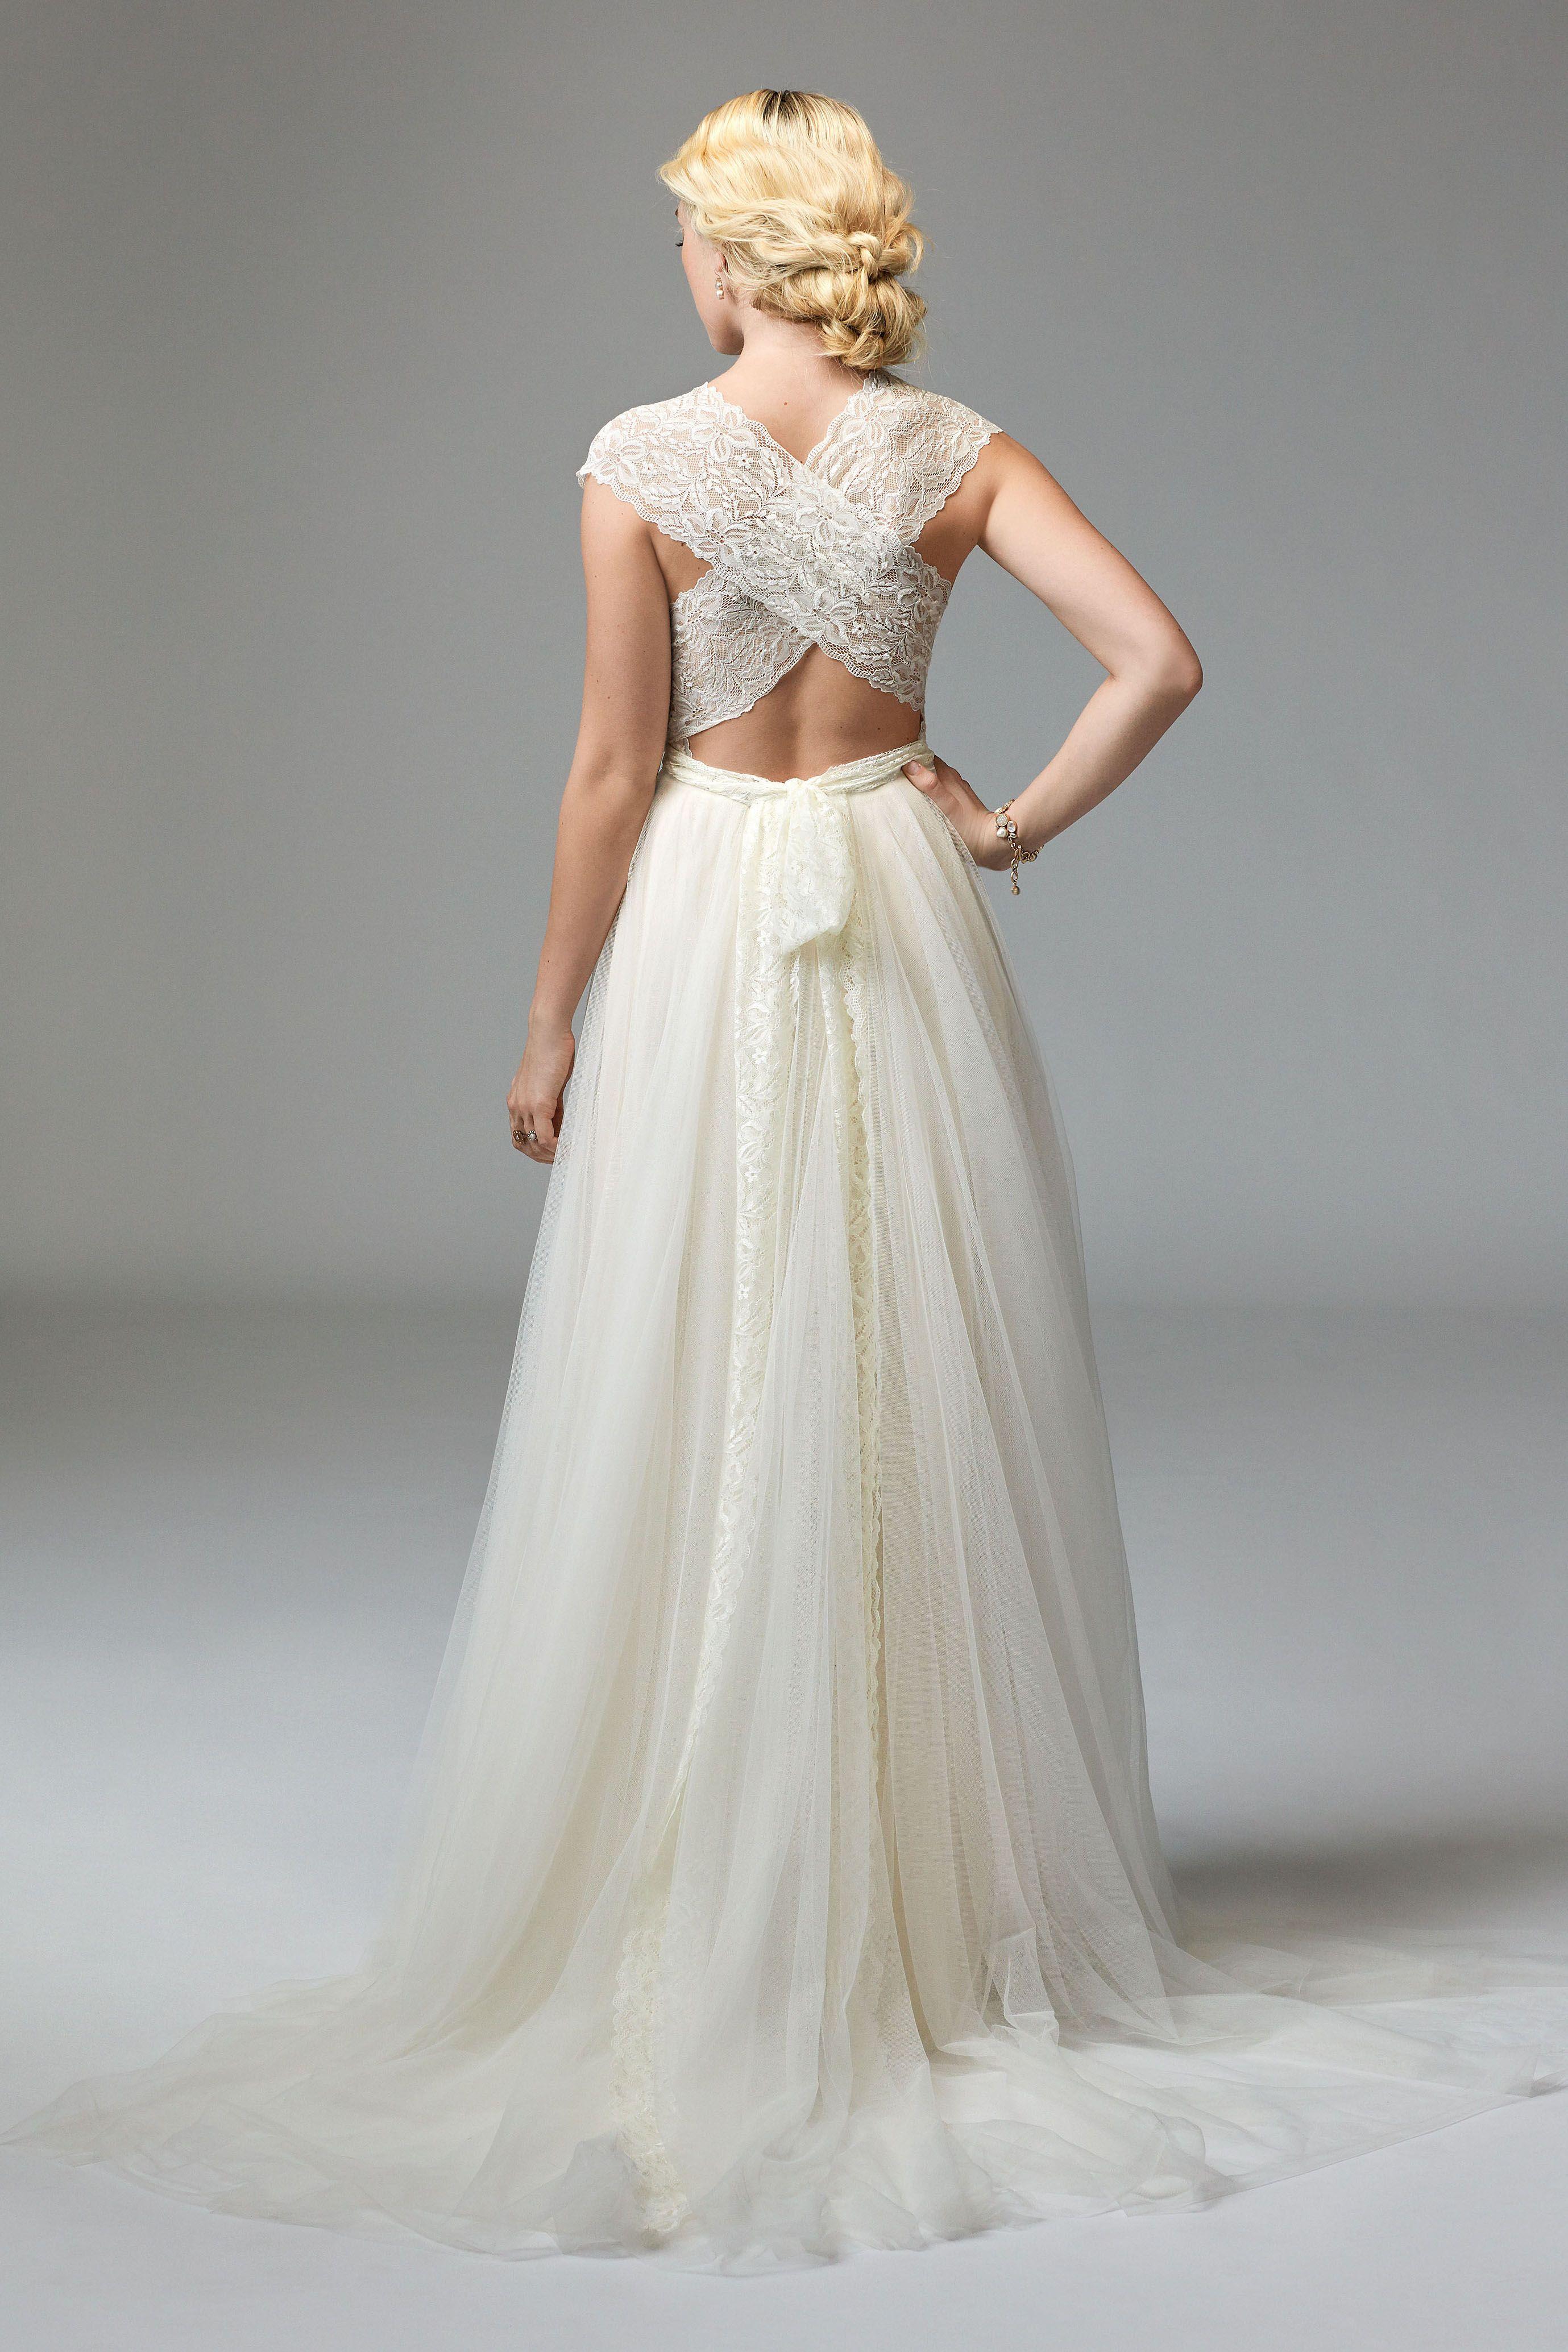 Infinity dresses the working bride - Wedding Dress